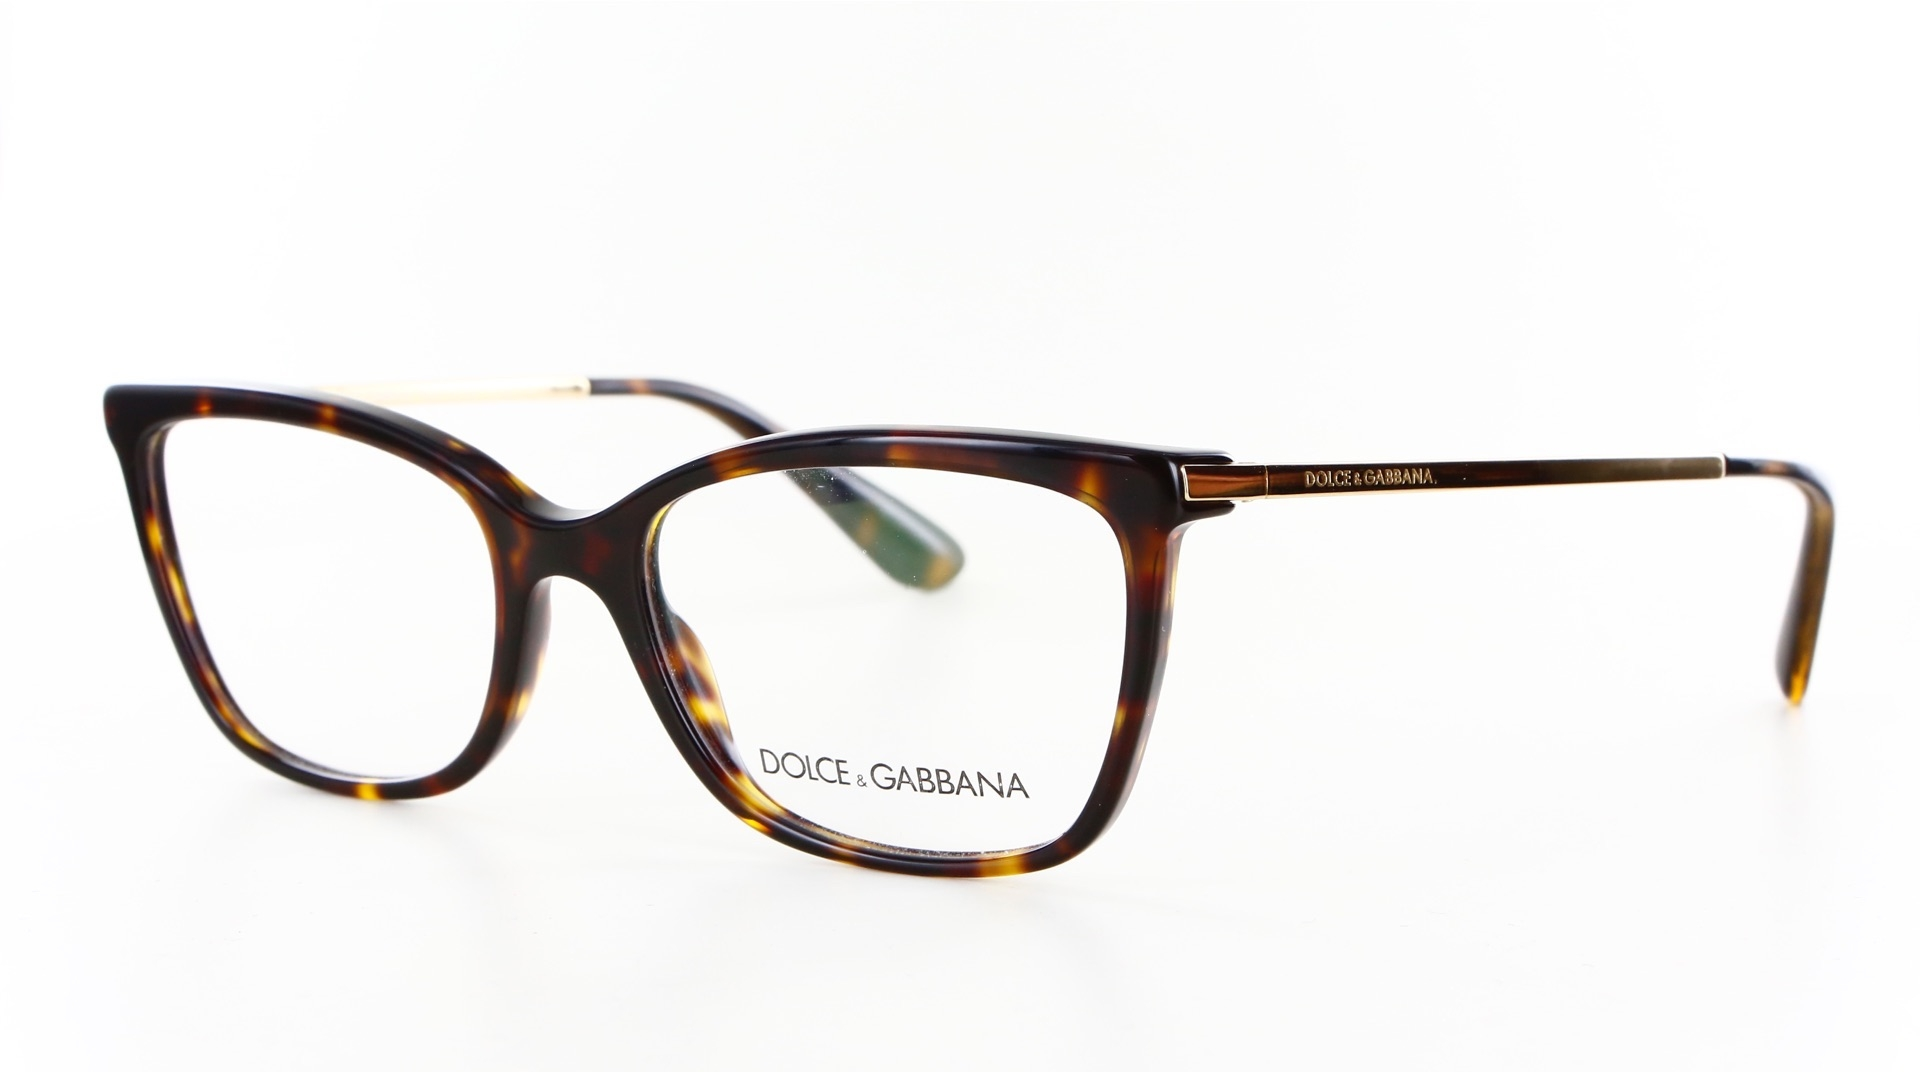 Dolce & Gabbana - ref: 74379